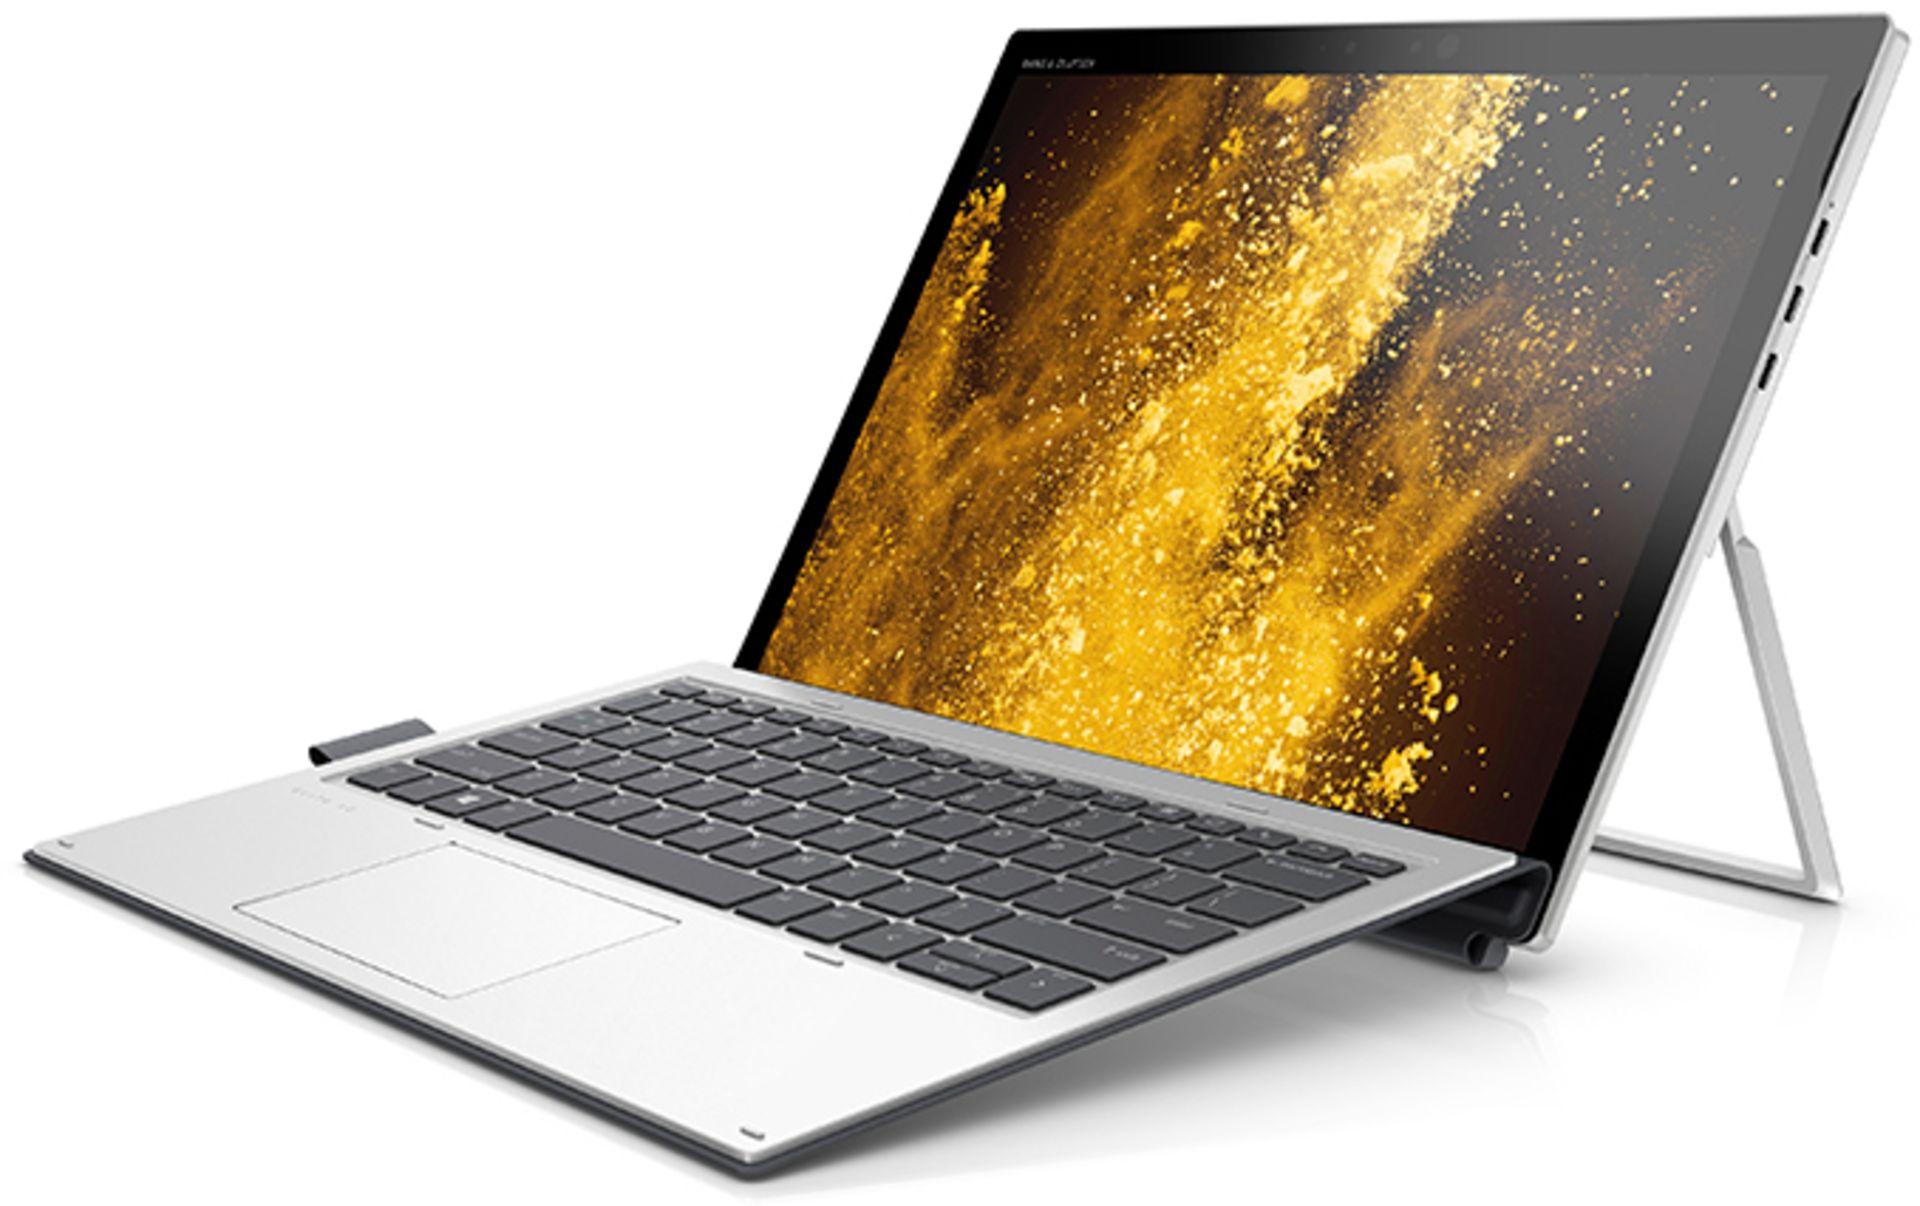 Lot 50039 - V Grade A HP Elite X2 1012 G1 Transformer Laptop & Tablet - Intel Core M7-6Y75 CPU 1.2Ghz - 8GB